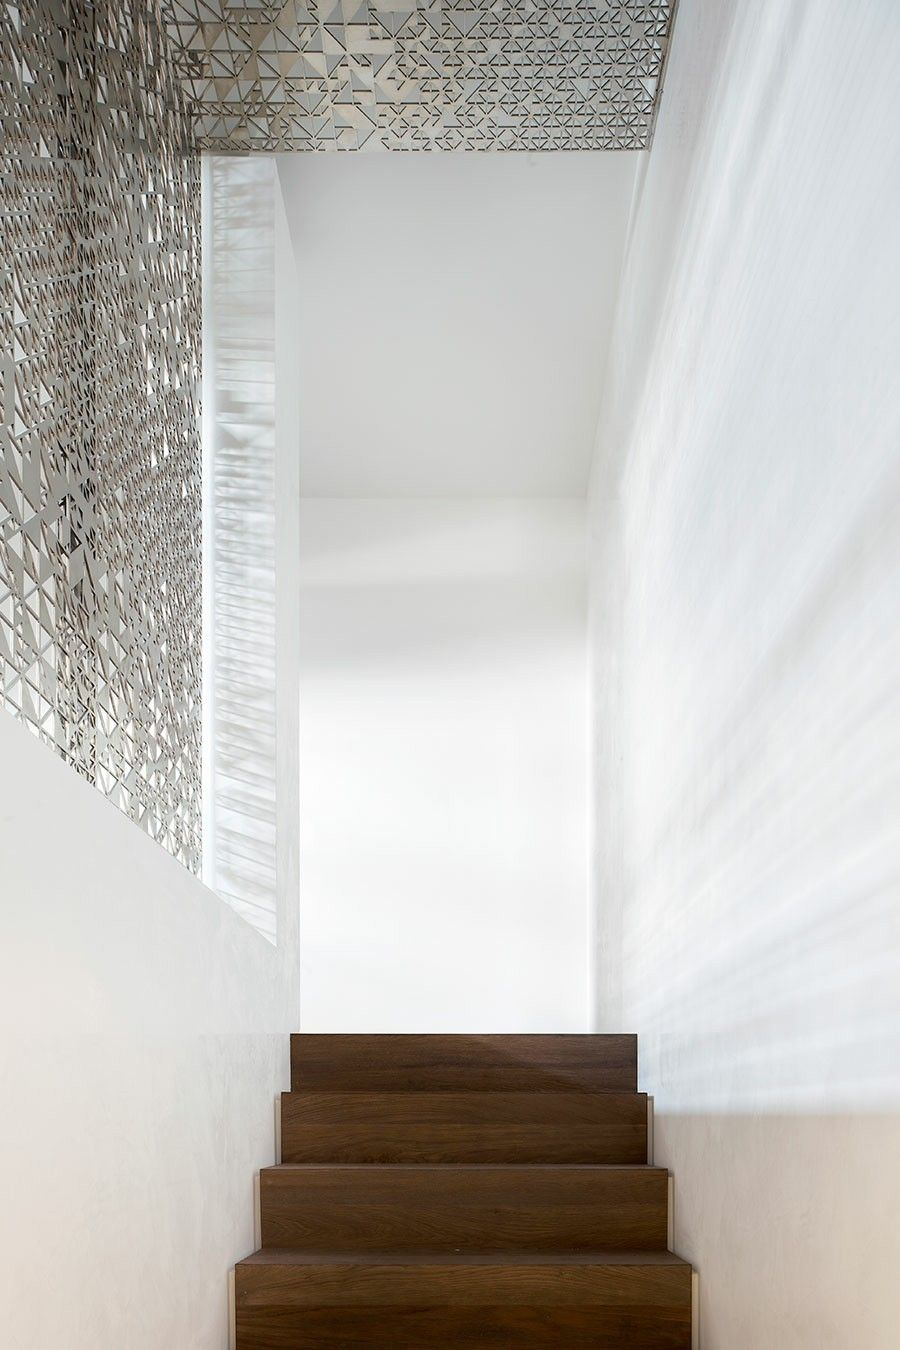 Hilztreppe Traumwohnung silberne Wanddekoration